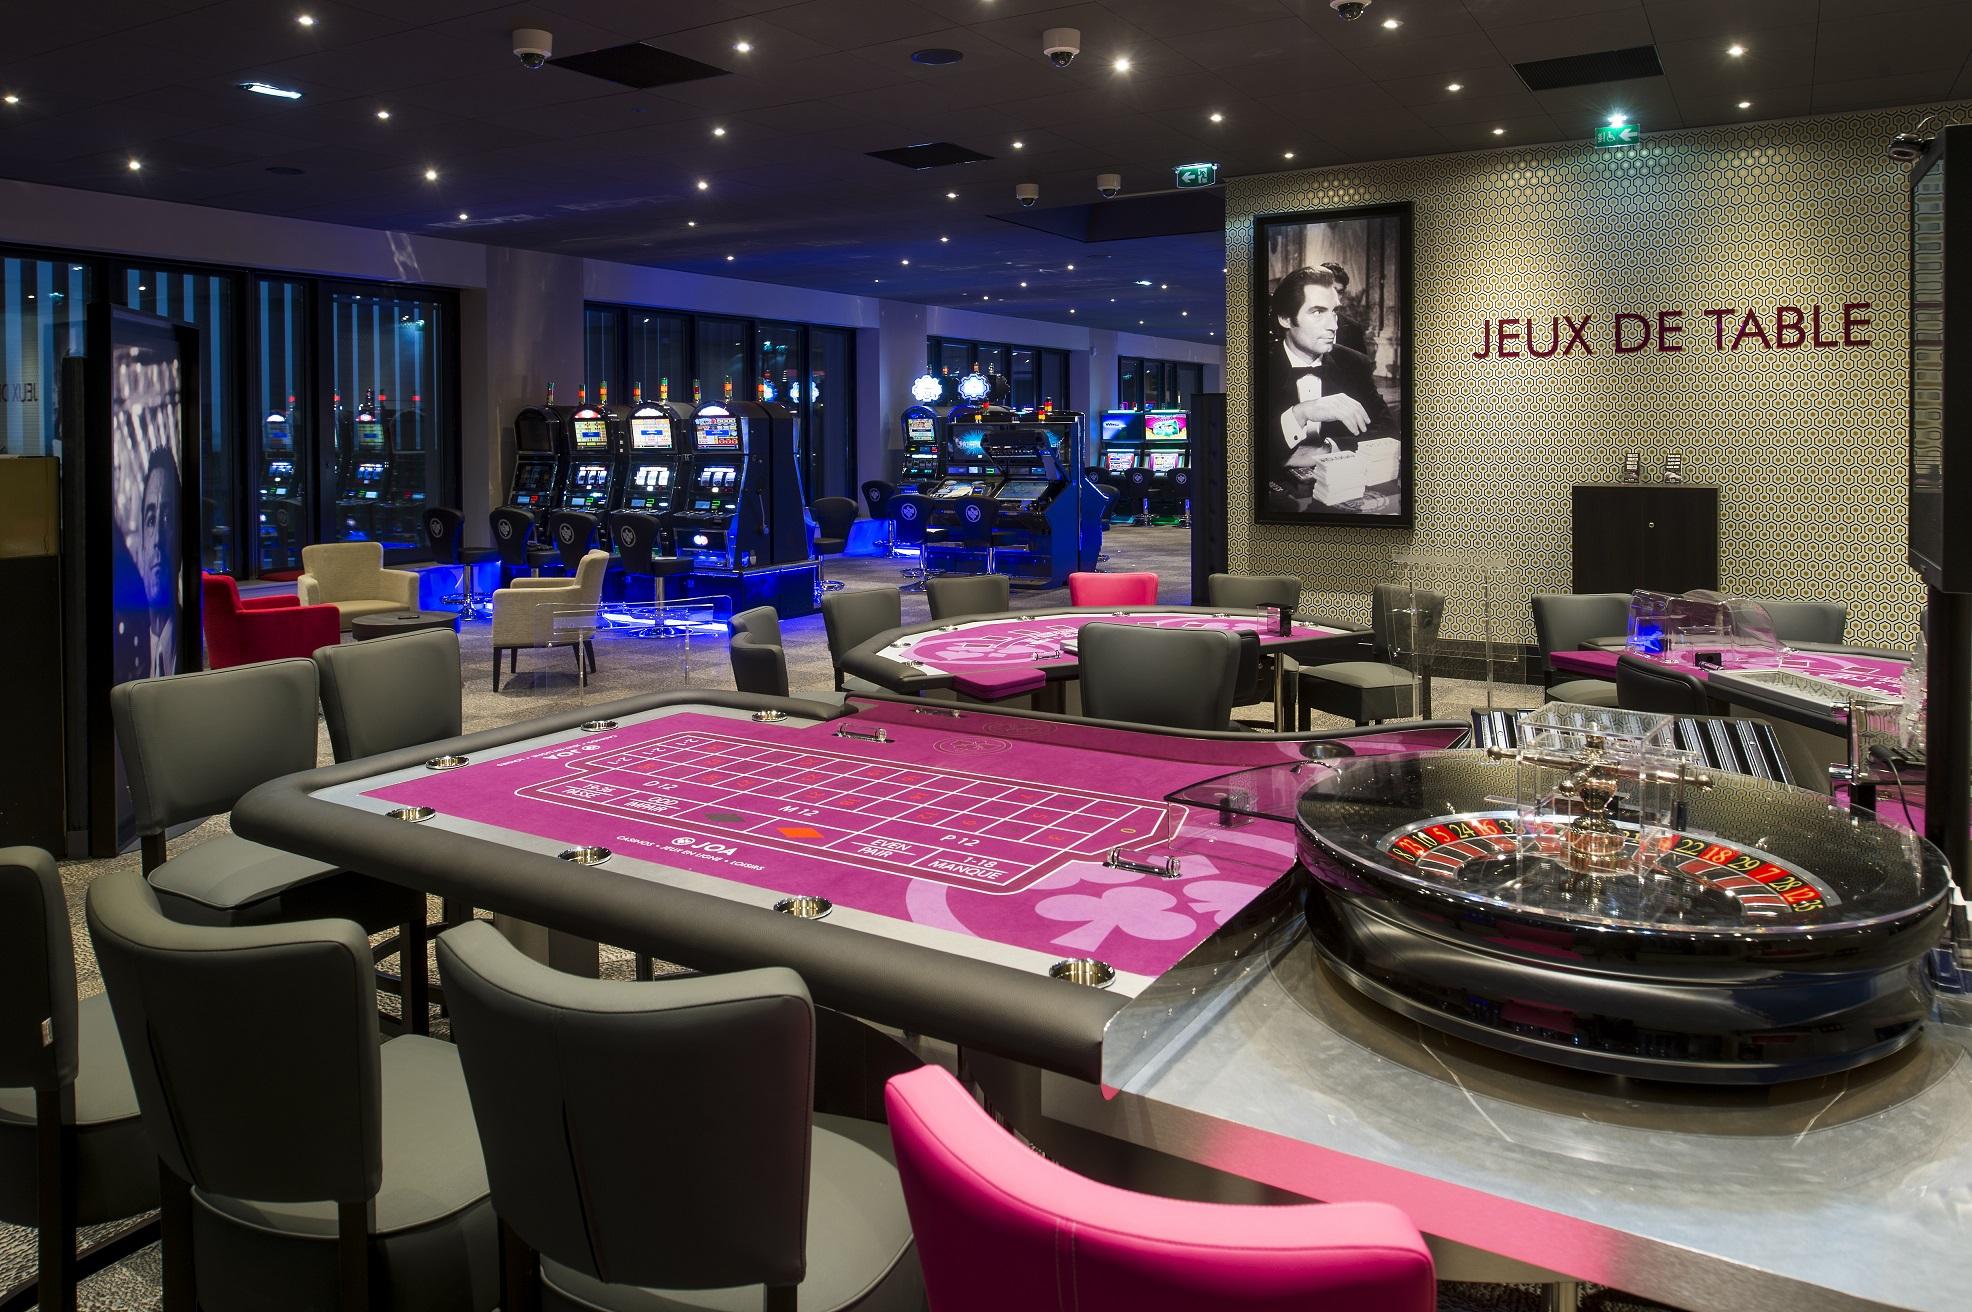 Casino joa lac du der giffaumont-champaubert poker at paris casino las vegas